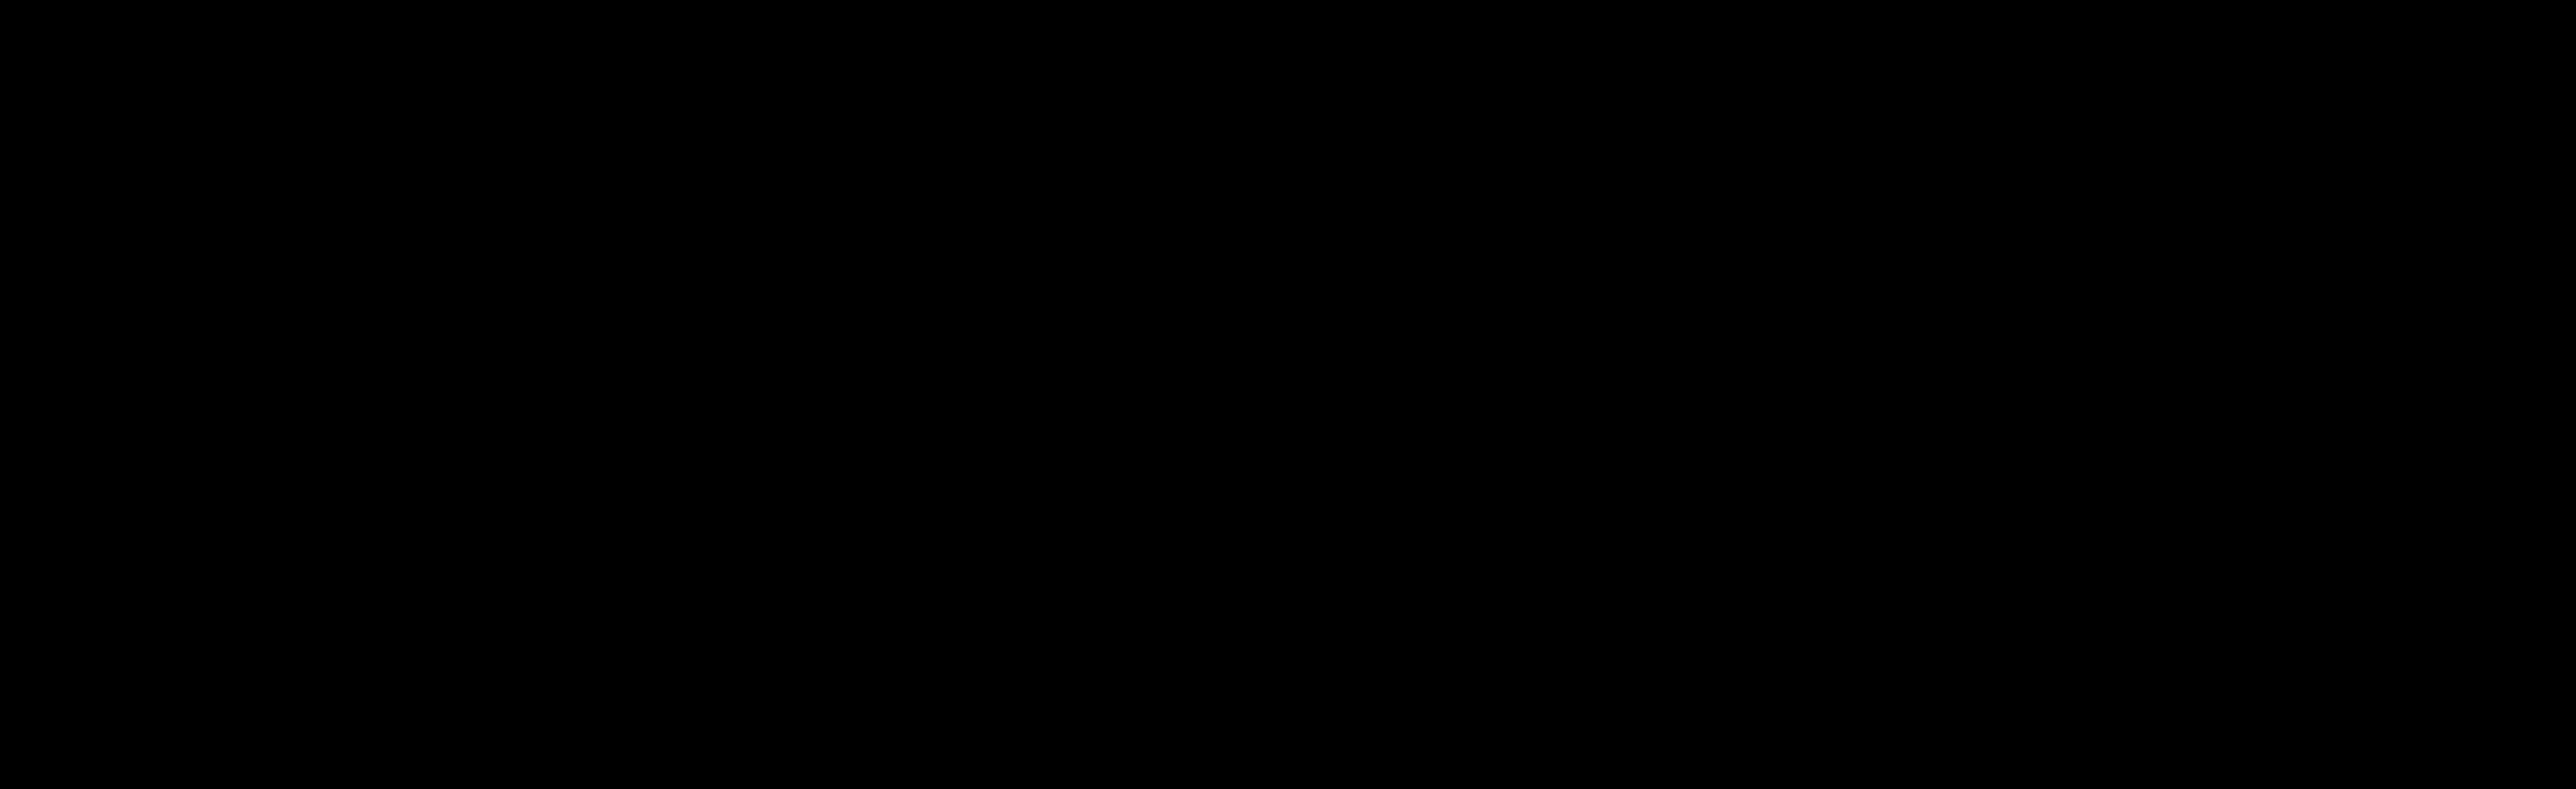 Dóttir